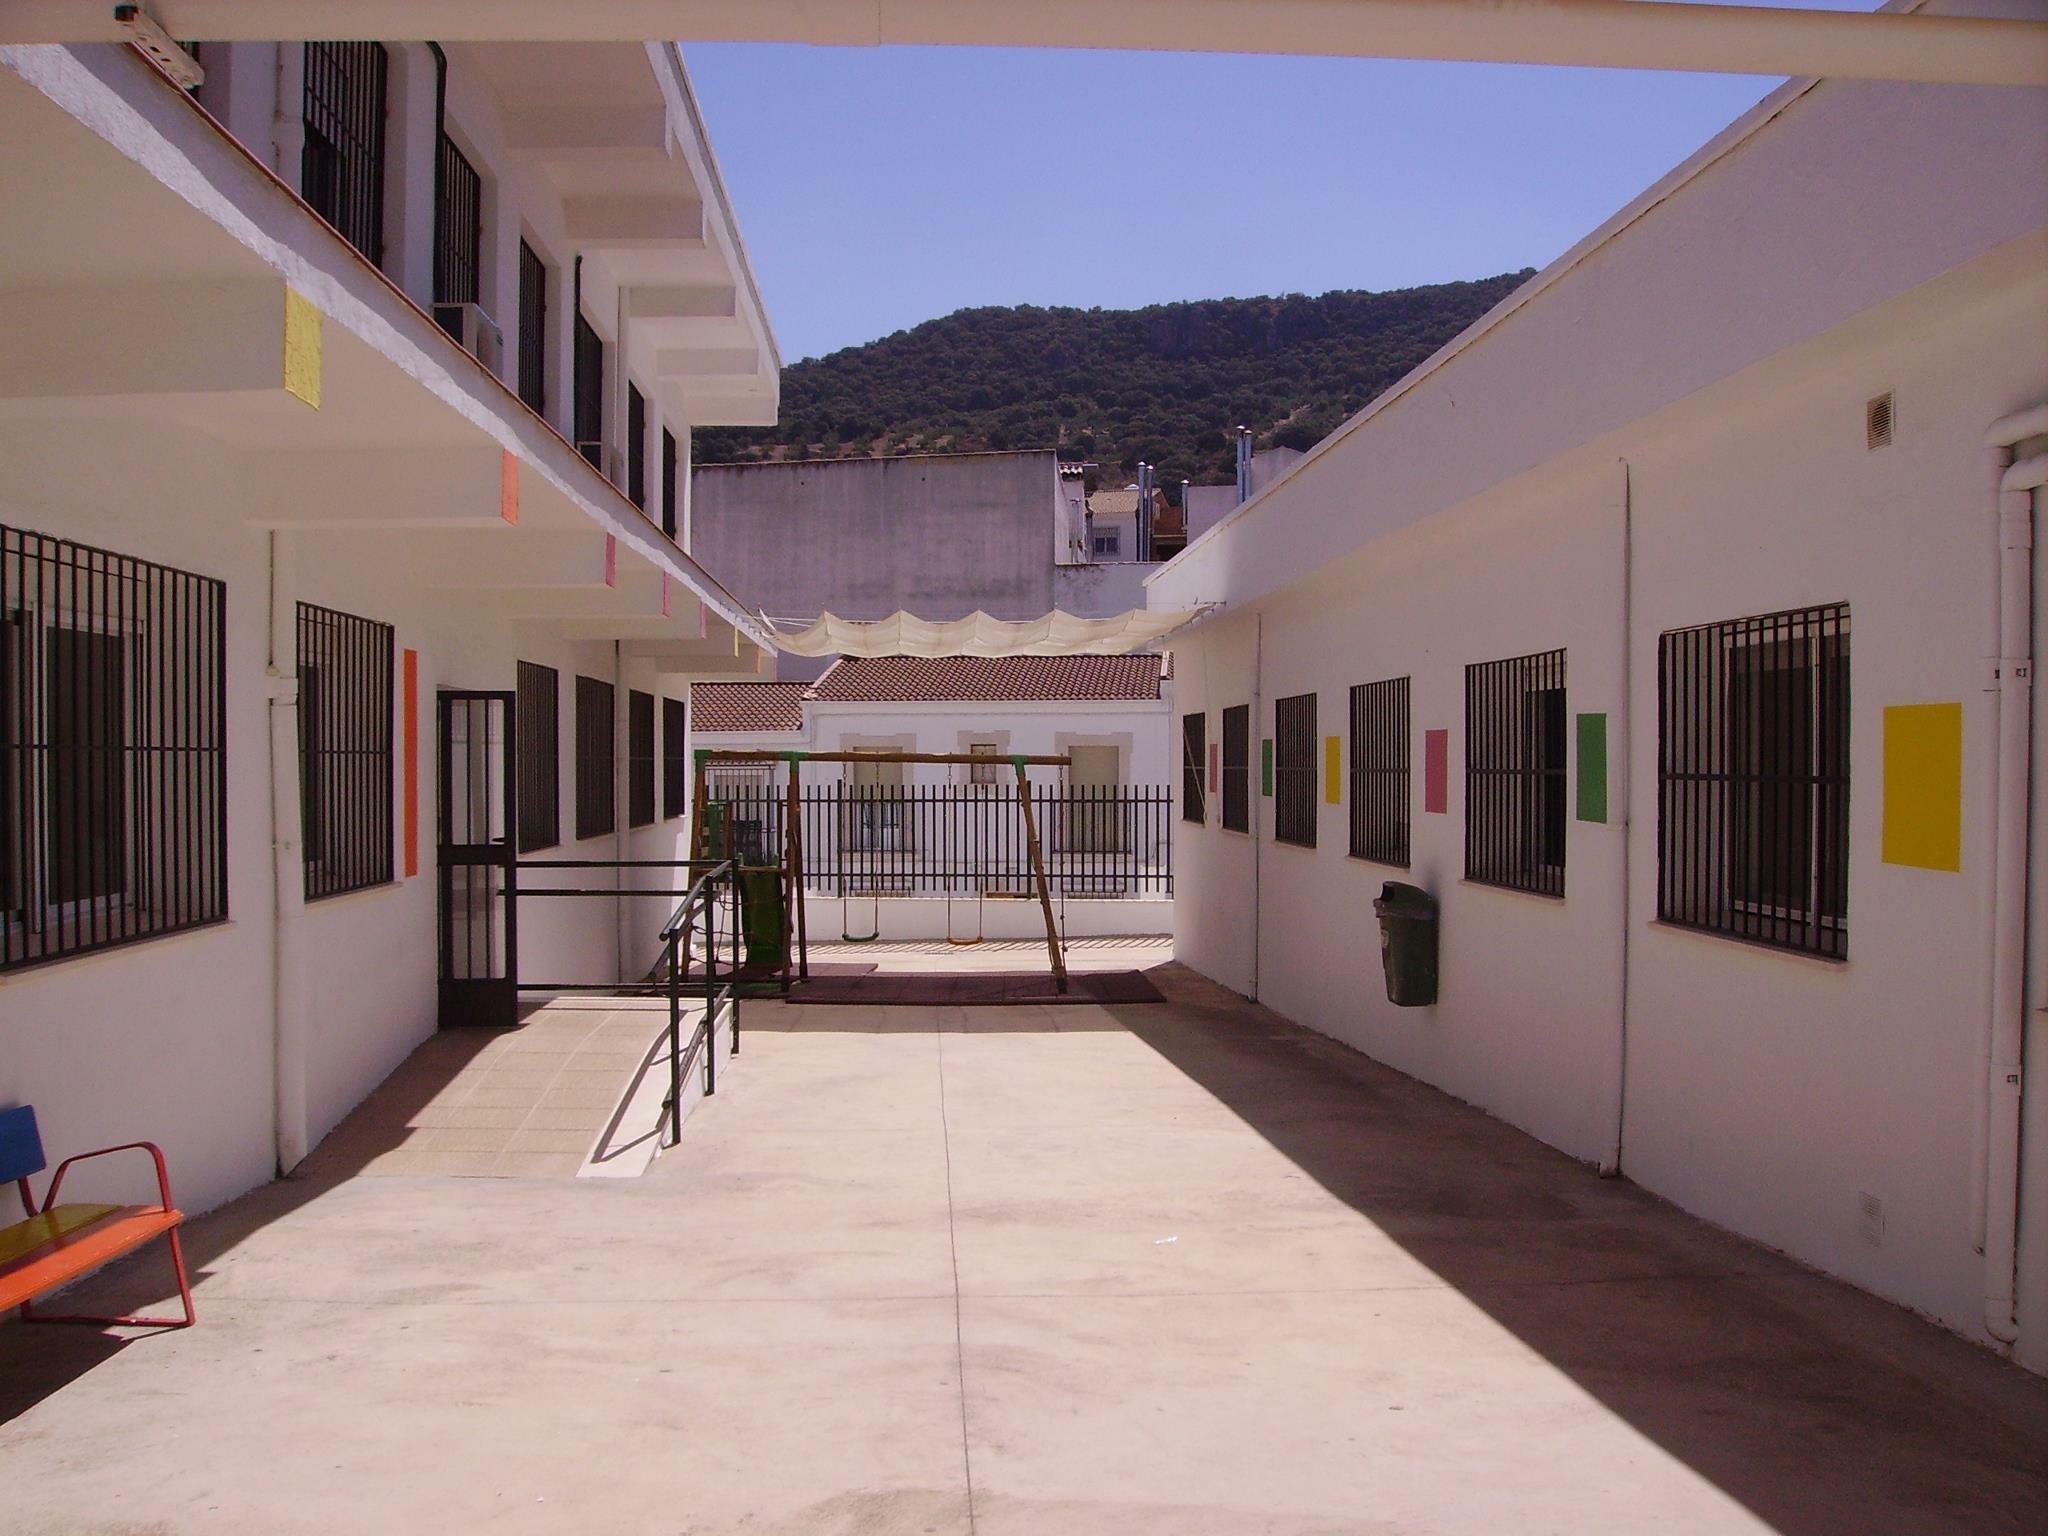 CEIP Rodríguez Vega 2